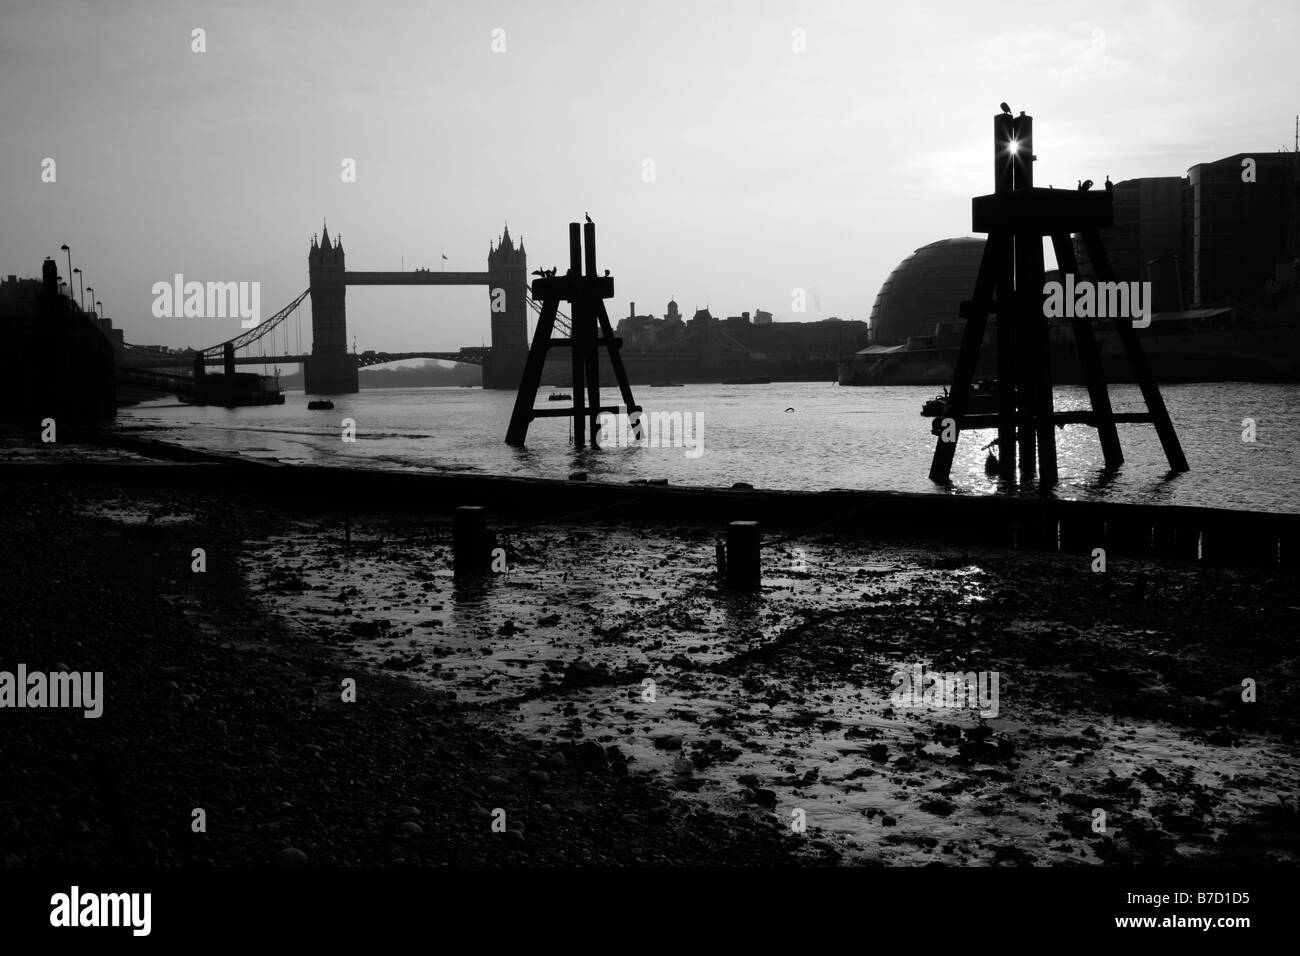 River Thames at Tower Bridge, London - Stock Image